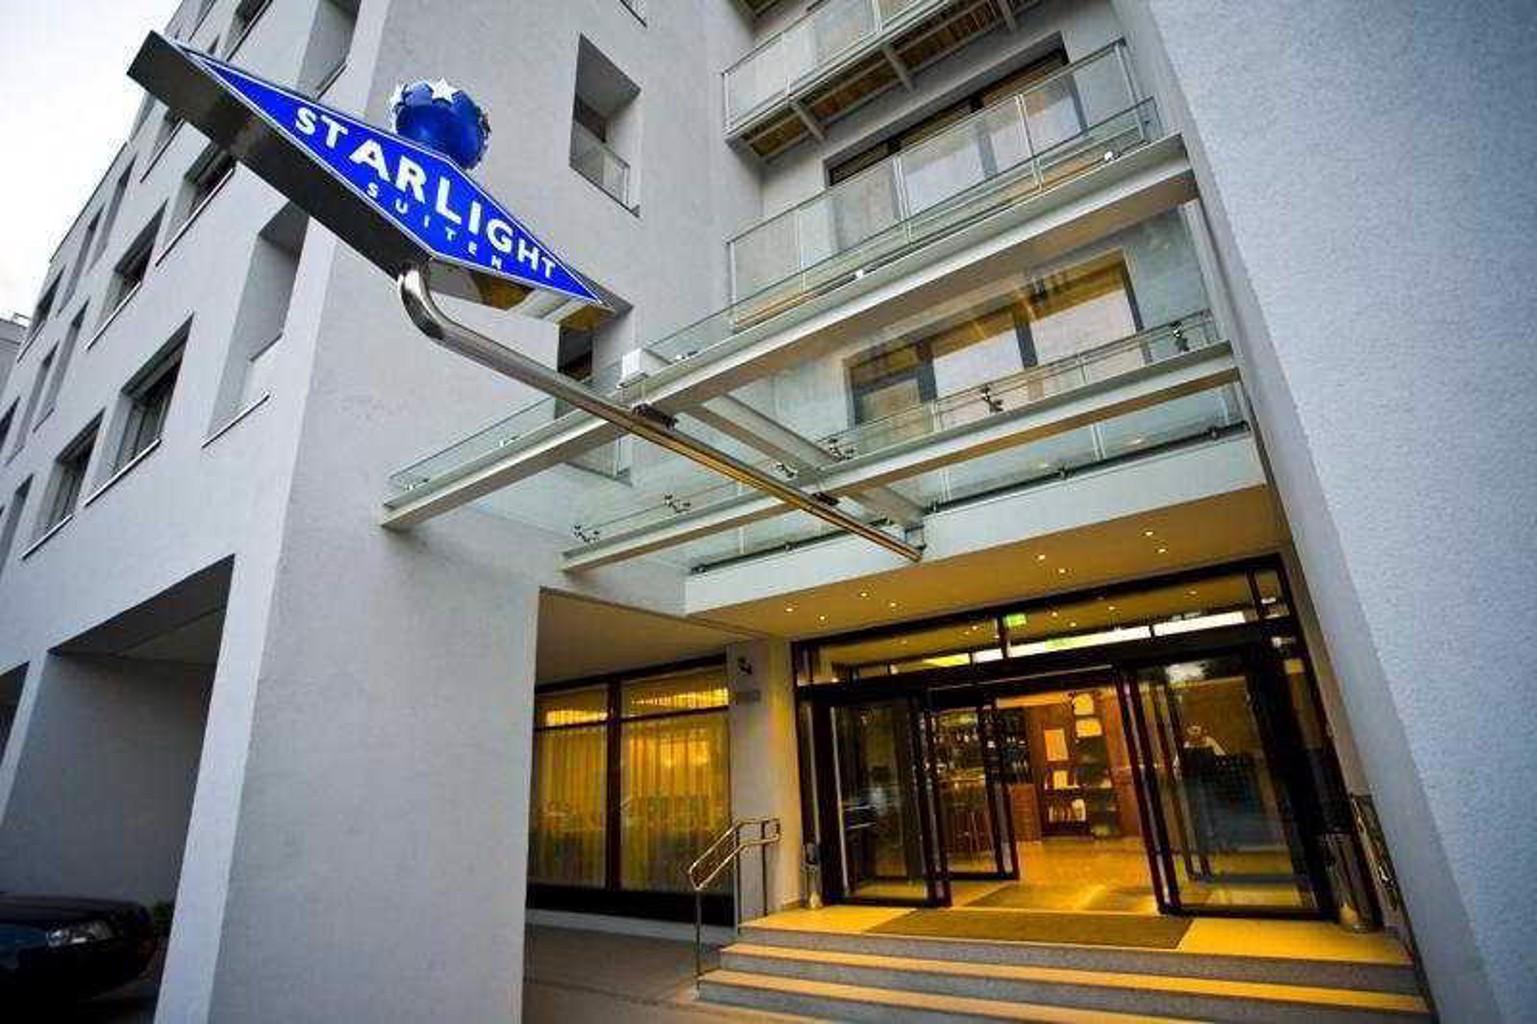 Starlight Suites Hotel